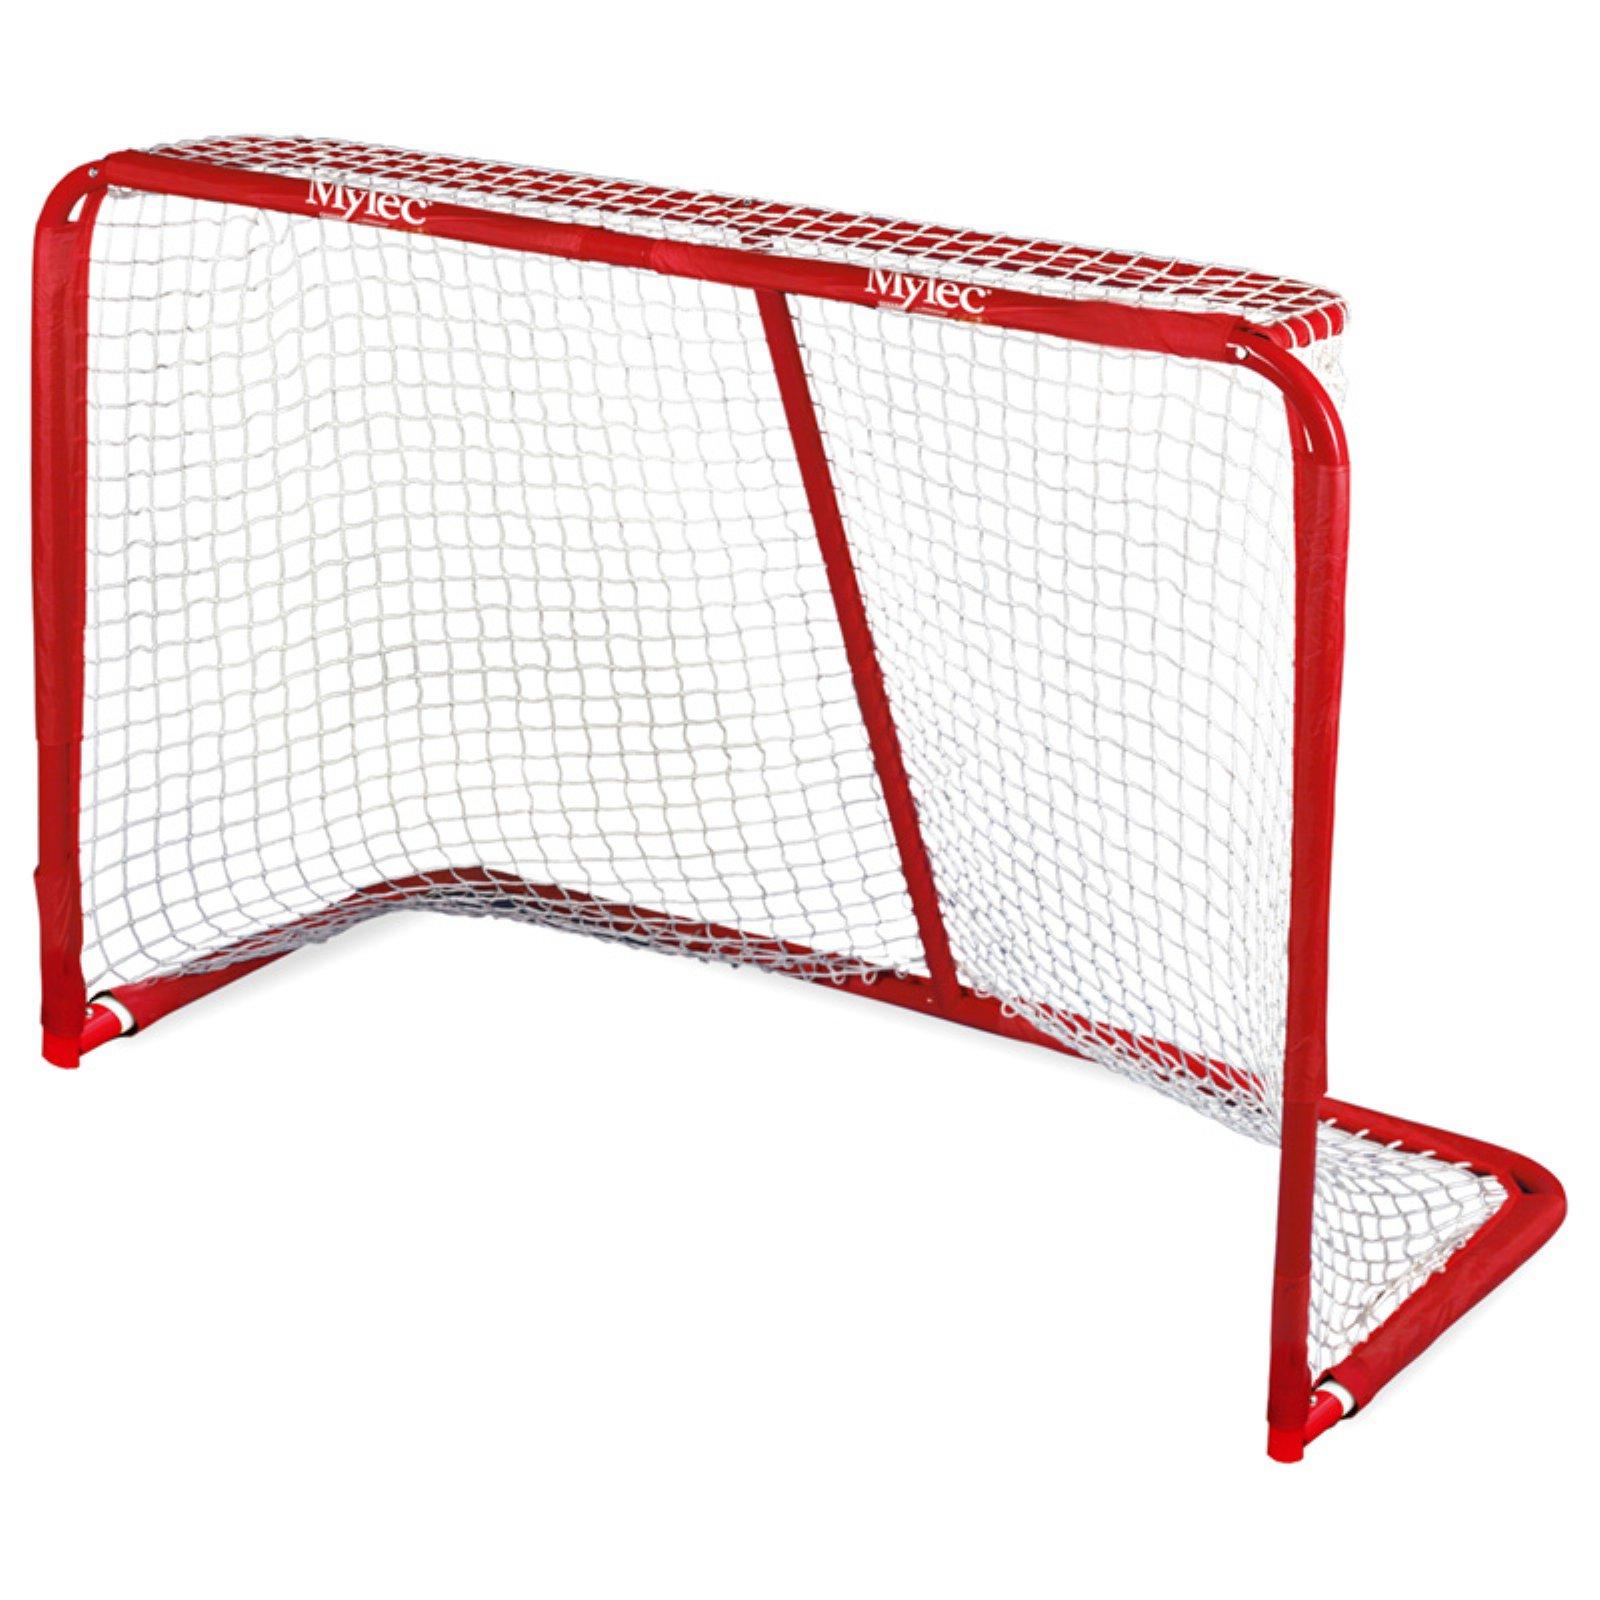 Mylec Official Pro Steel Hockey Goal